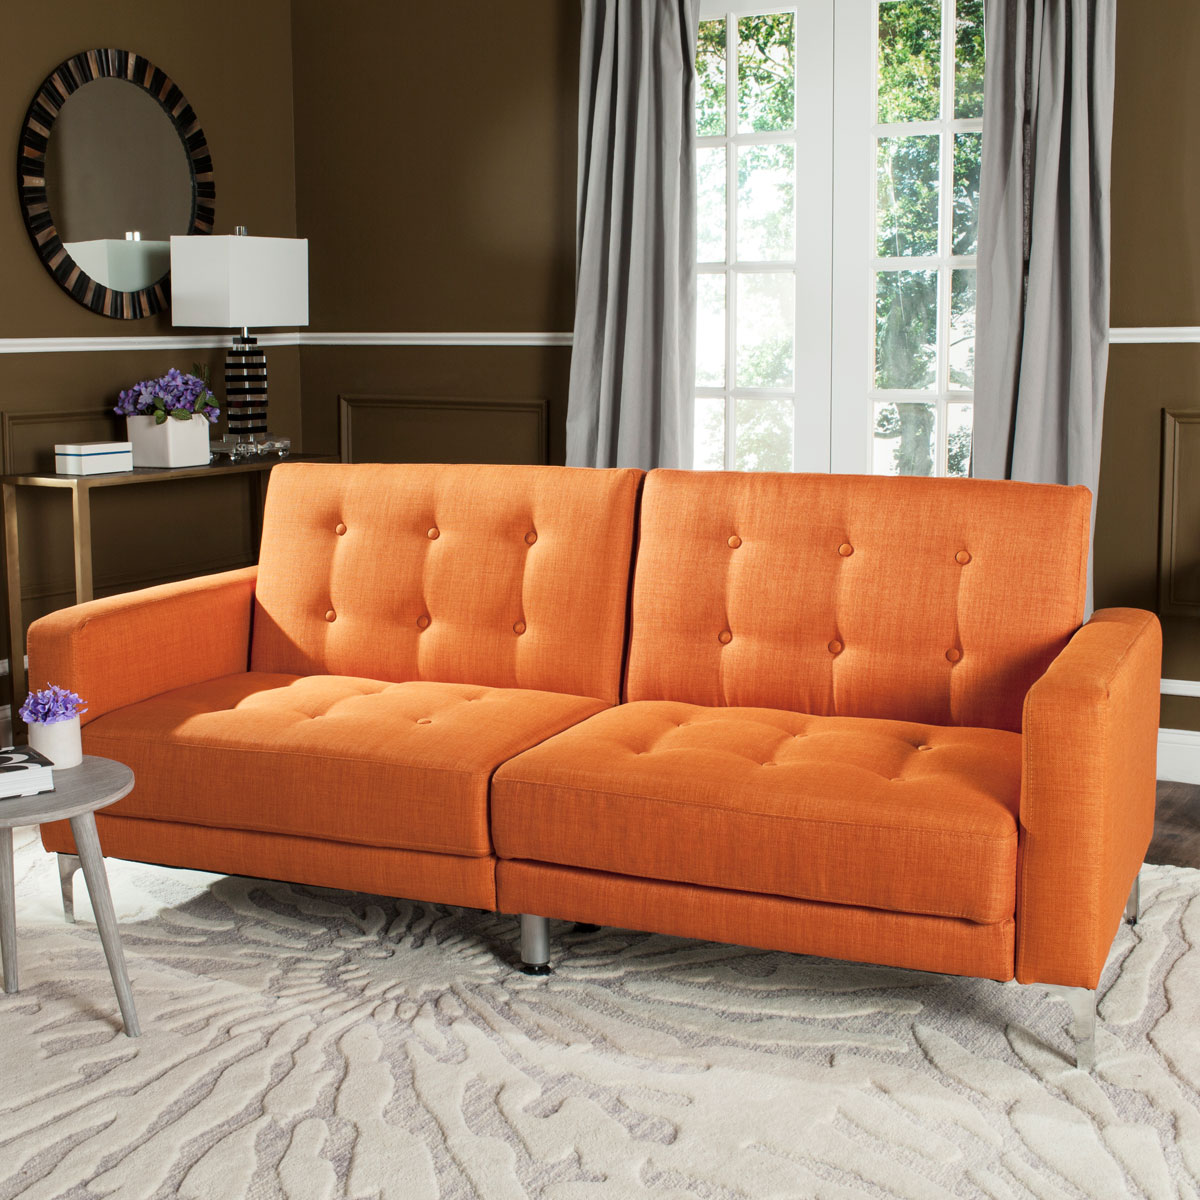 Fresh Upholstered Sofa Bed | Futon - Safavieh.com DN69